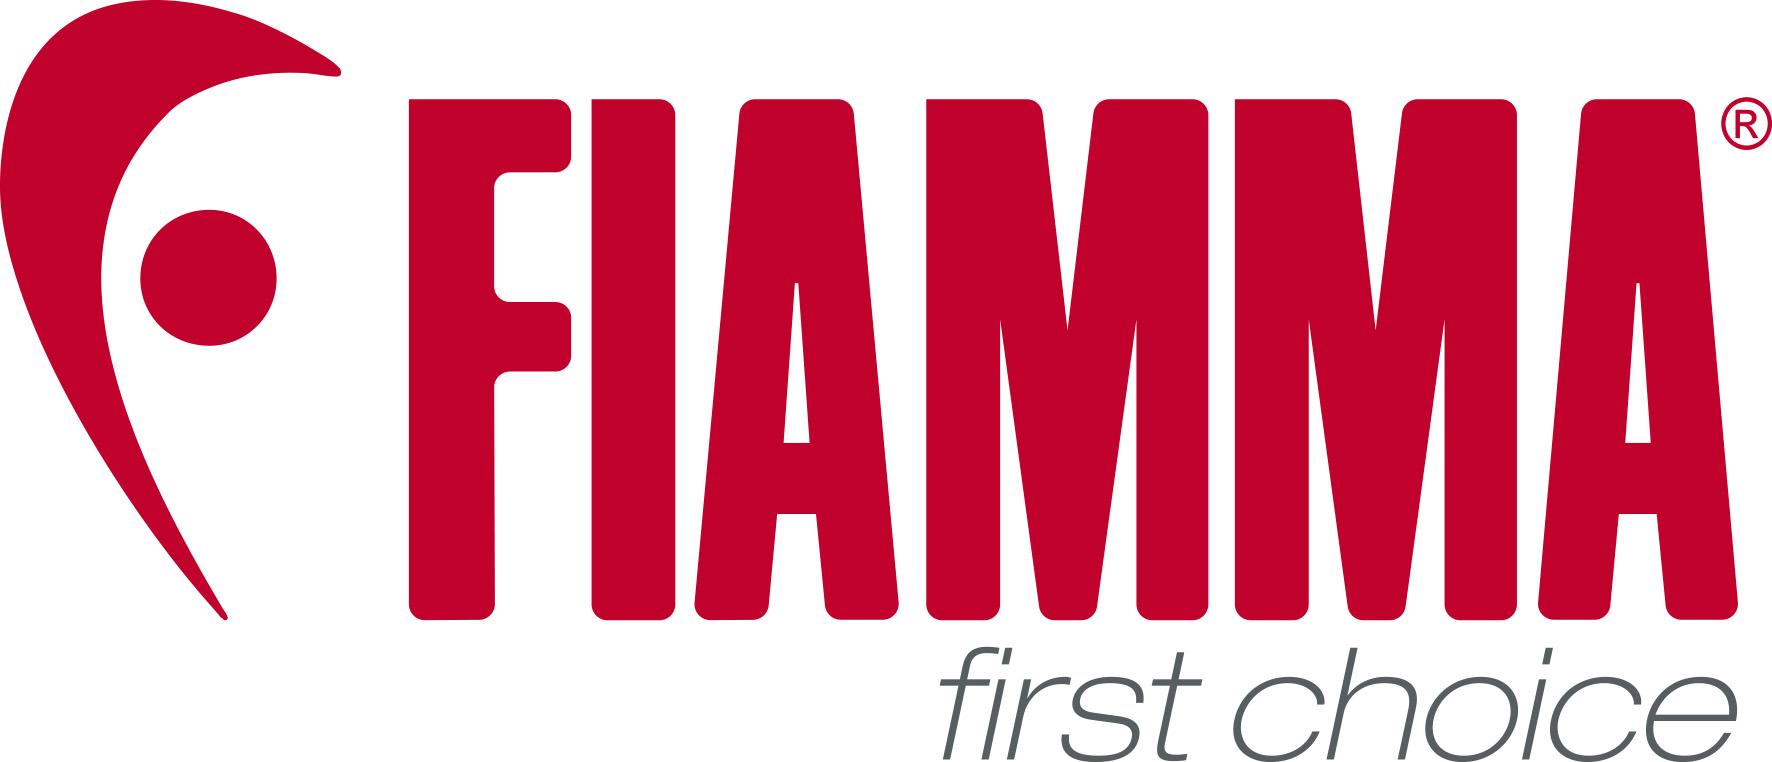 lg_fiamma first choice